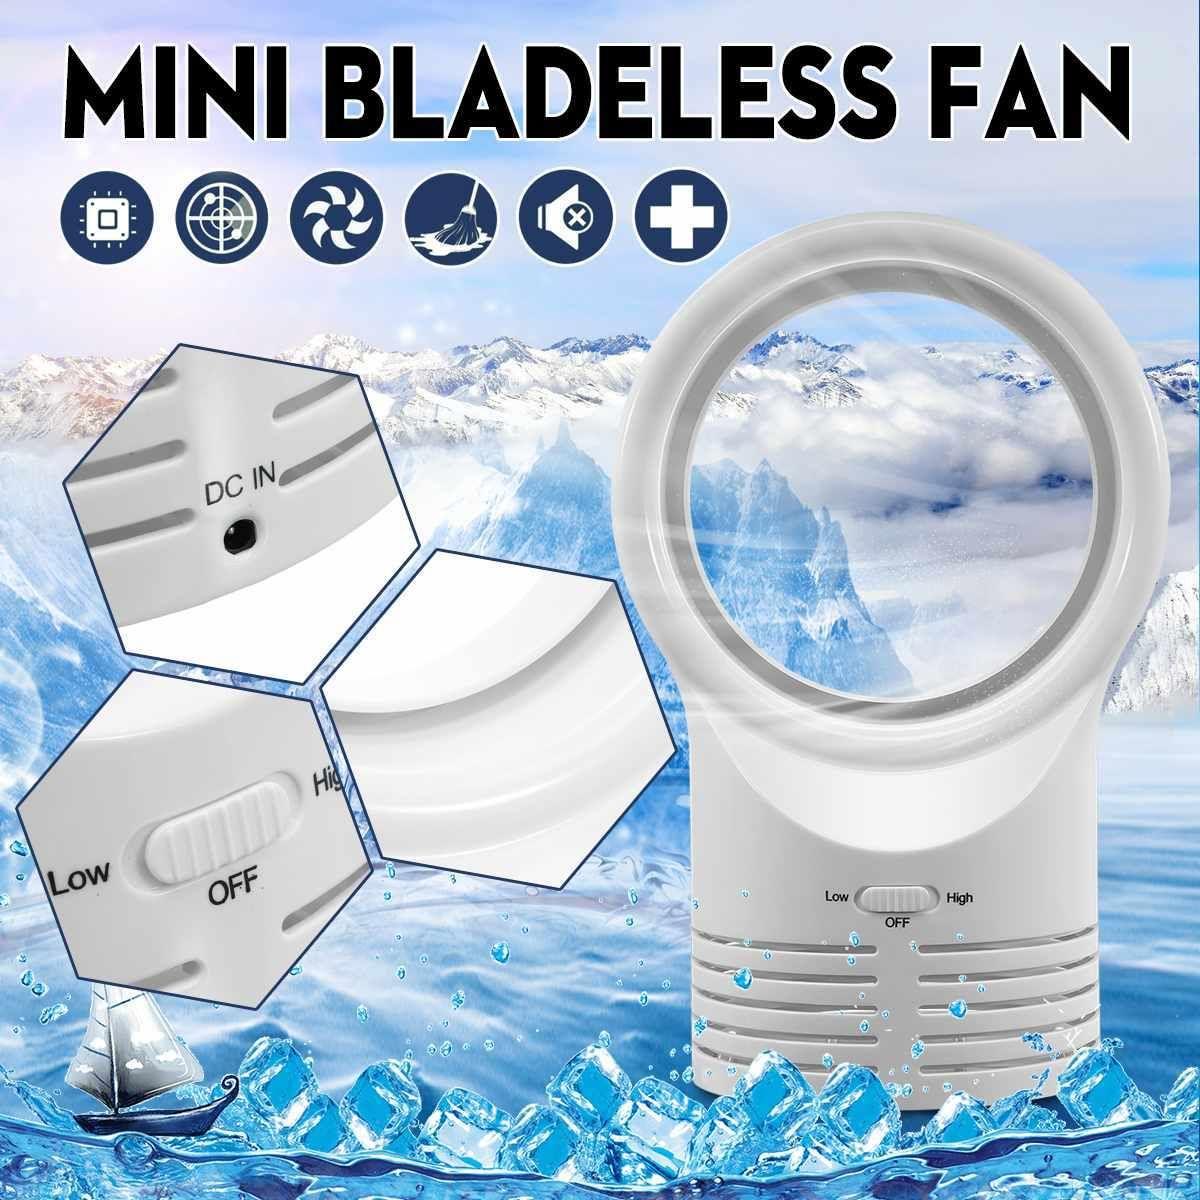 12v Portable Usb Bladeless Fan Electric Table Mini Bladeless